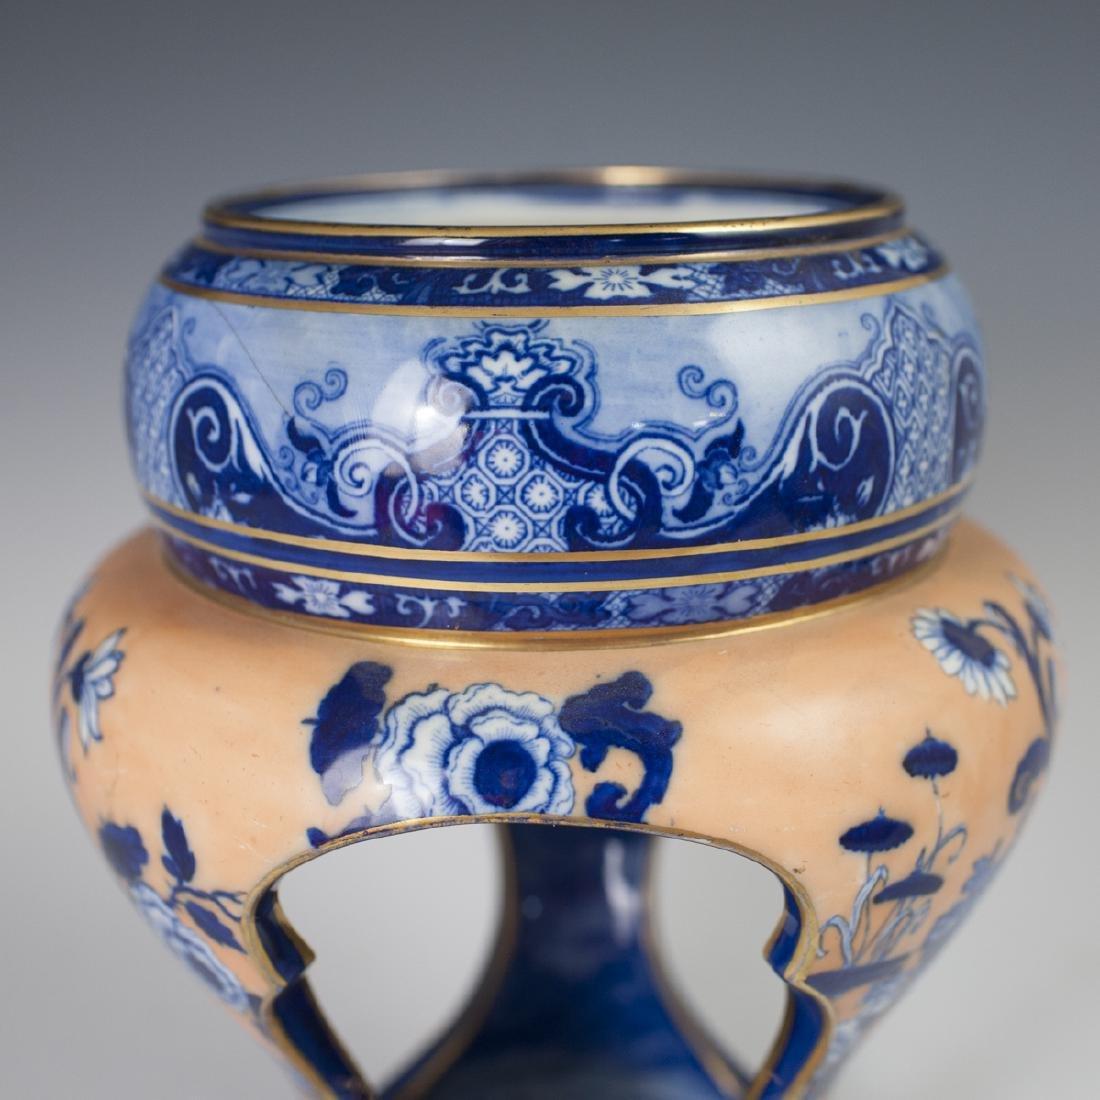 Doulton Burslem Porcelain Vase - 7